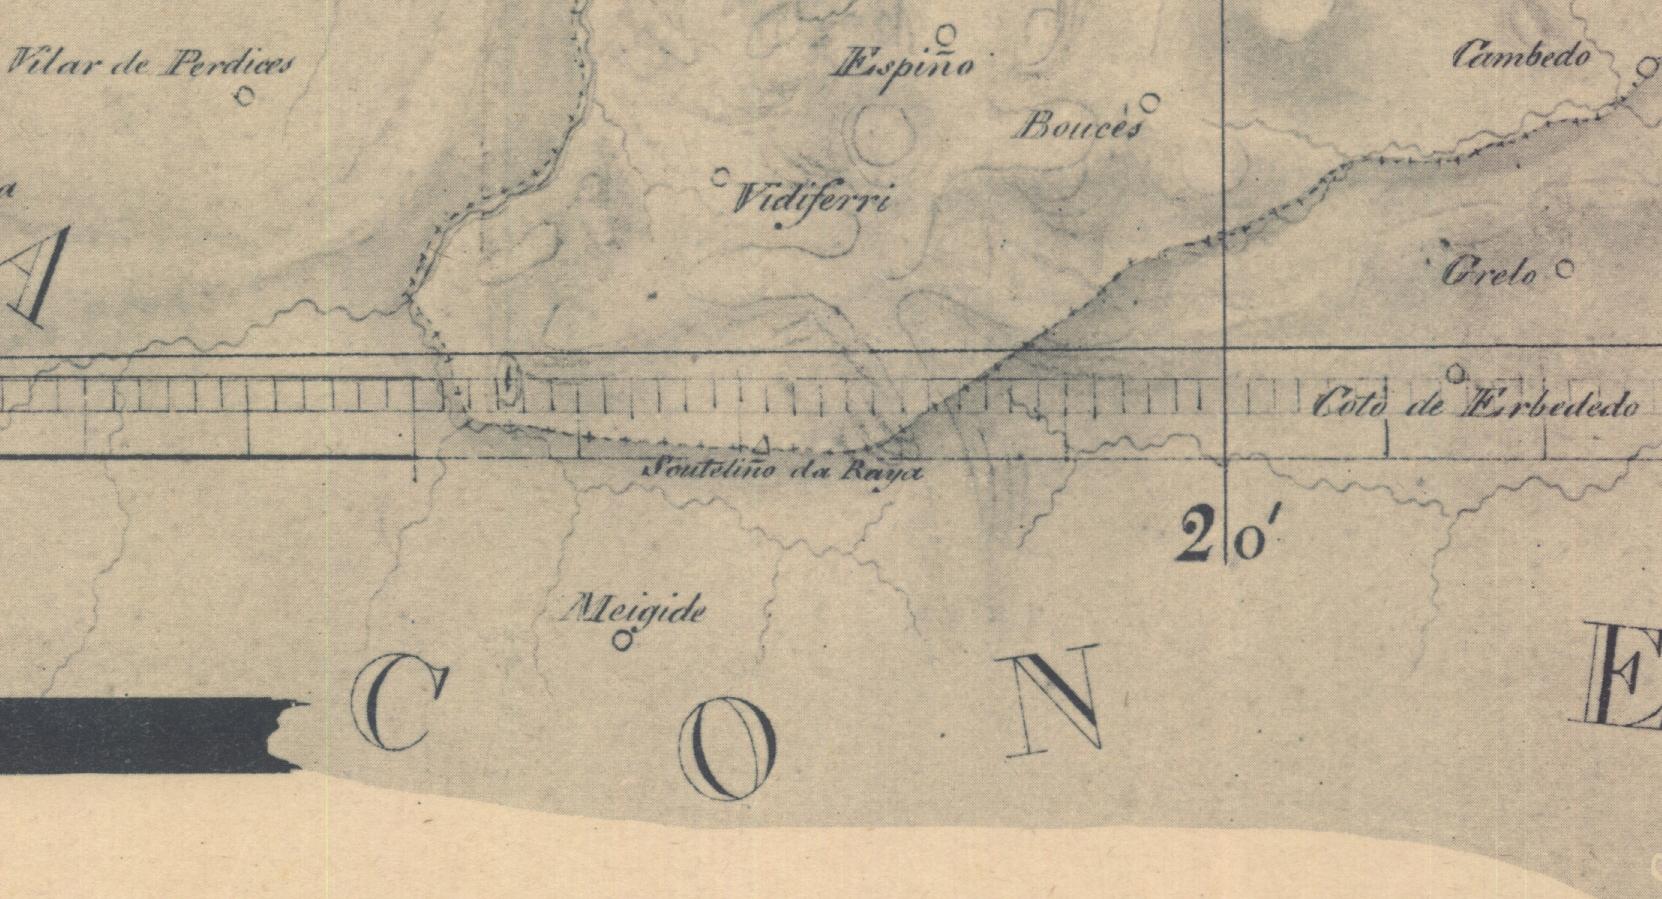 hight resolution of file soutelinho na carta geom trica de galiza 1834 jpg